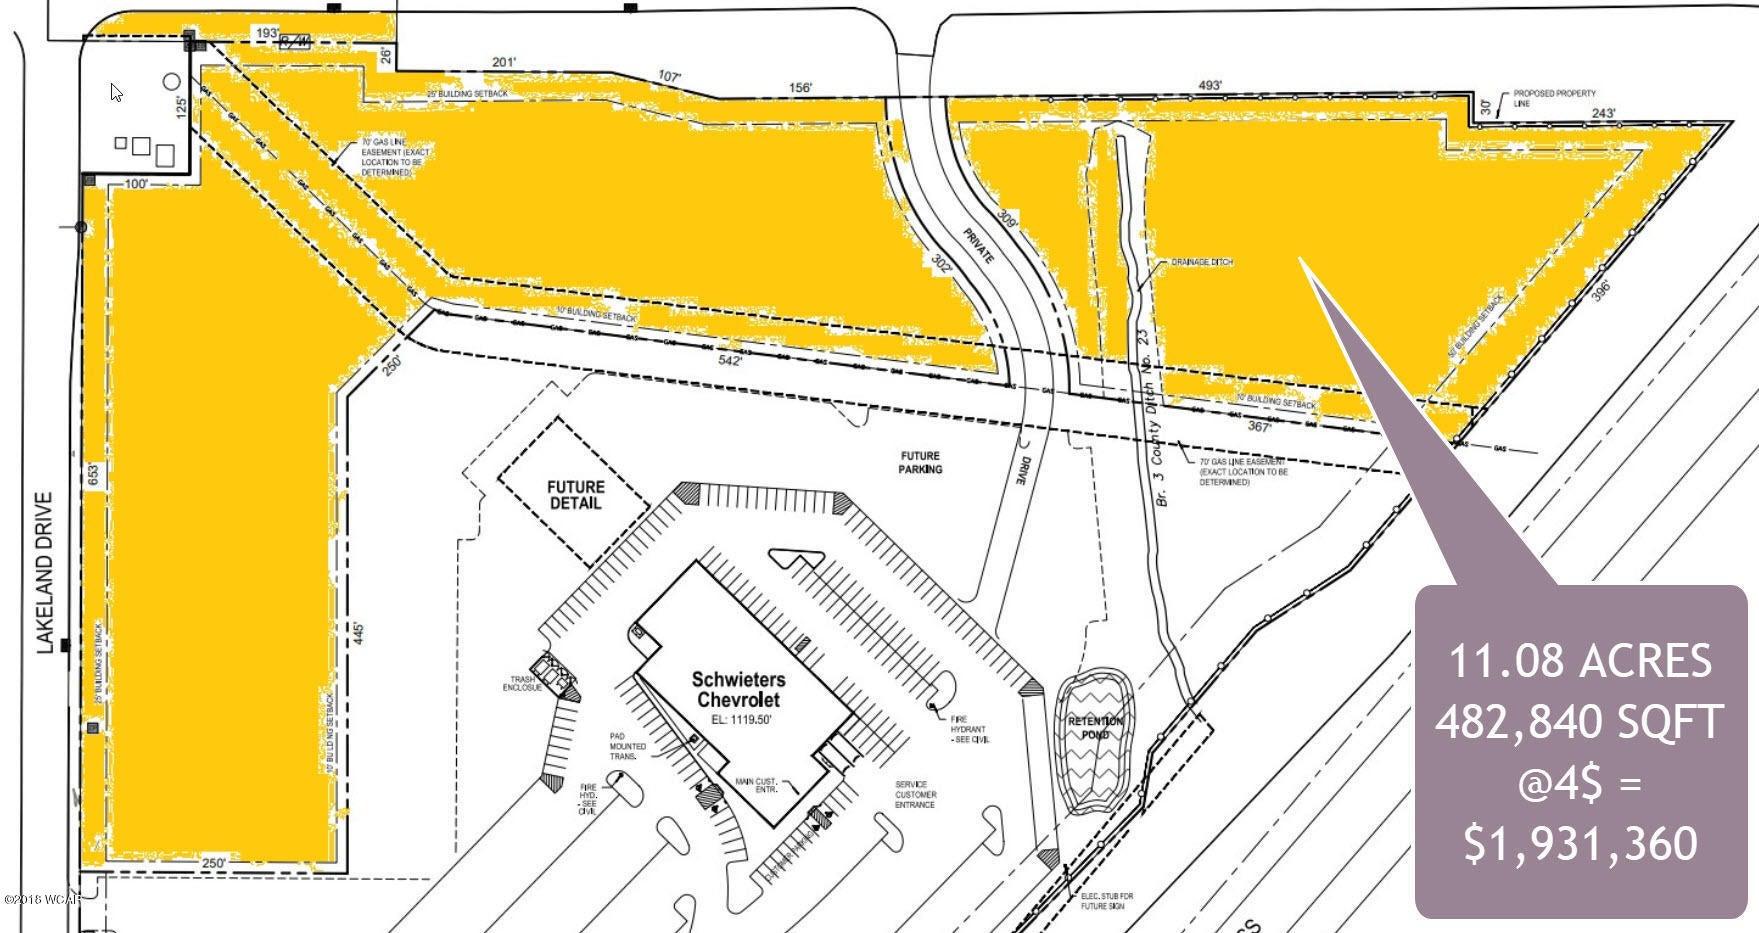 Tbd Willmar Ave,Willmar,Commercial Land,Willmar Ave,6029913